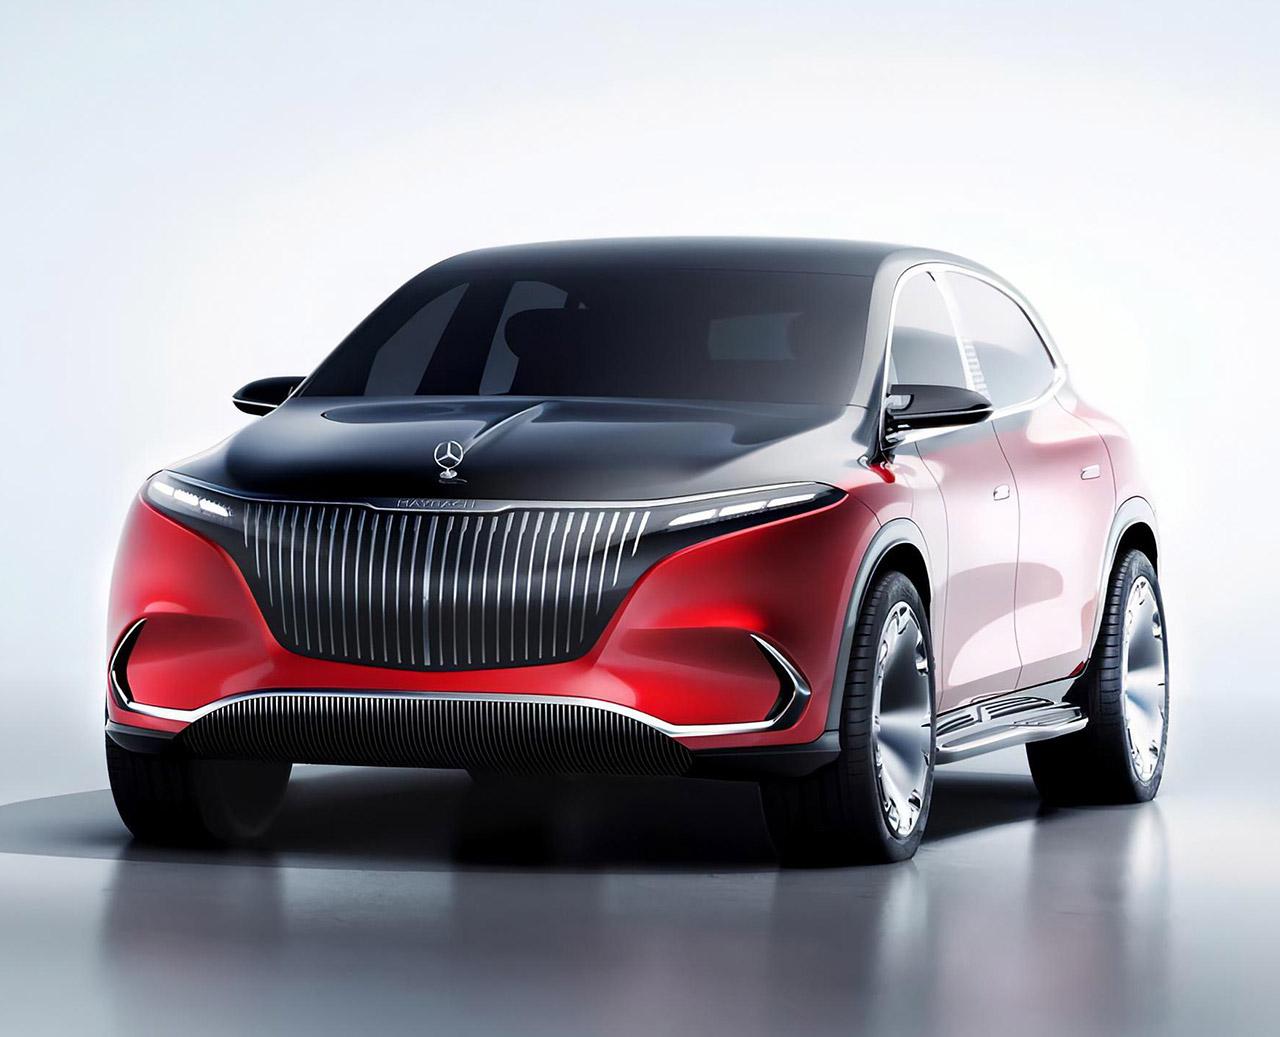 Mercedes-Maybach EQS Electric SUV